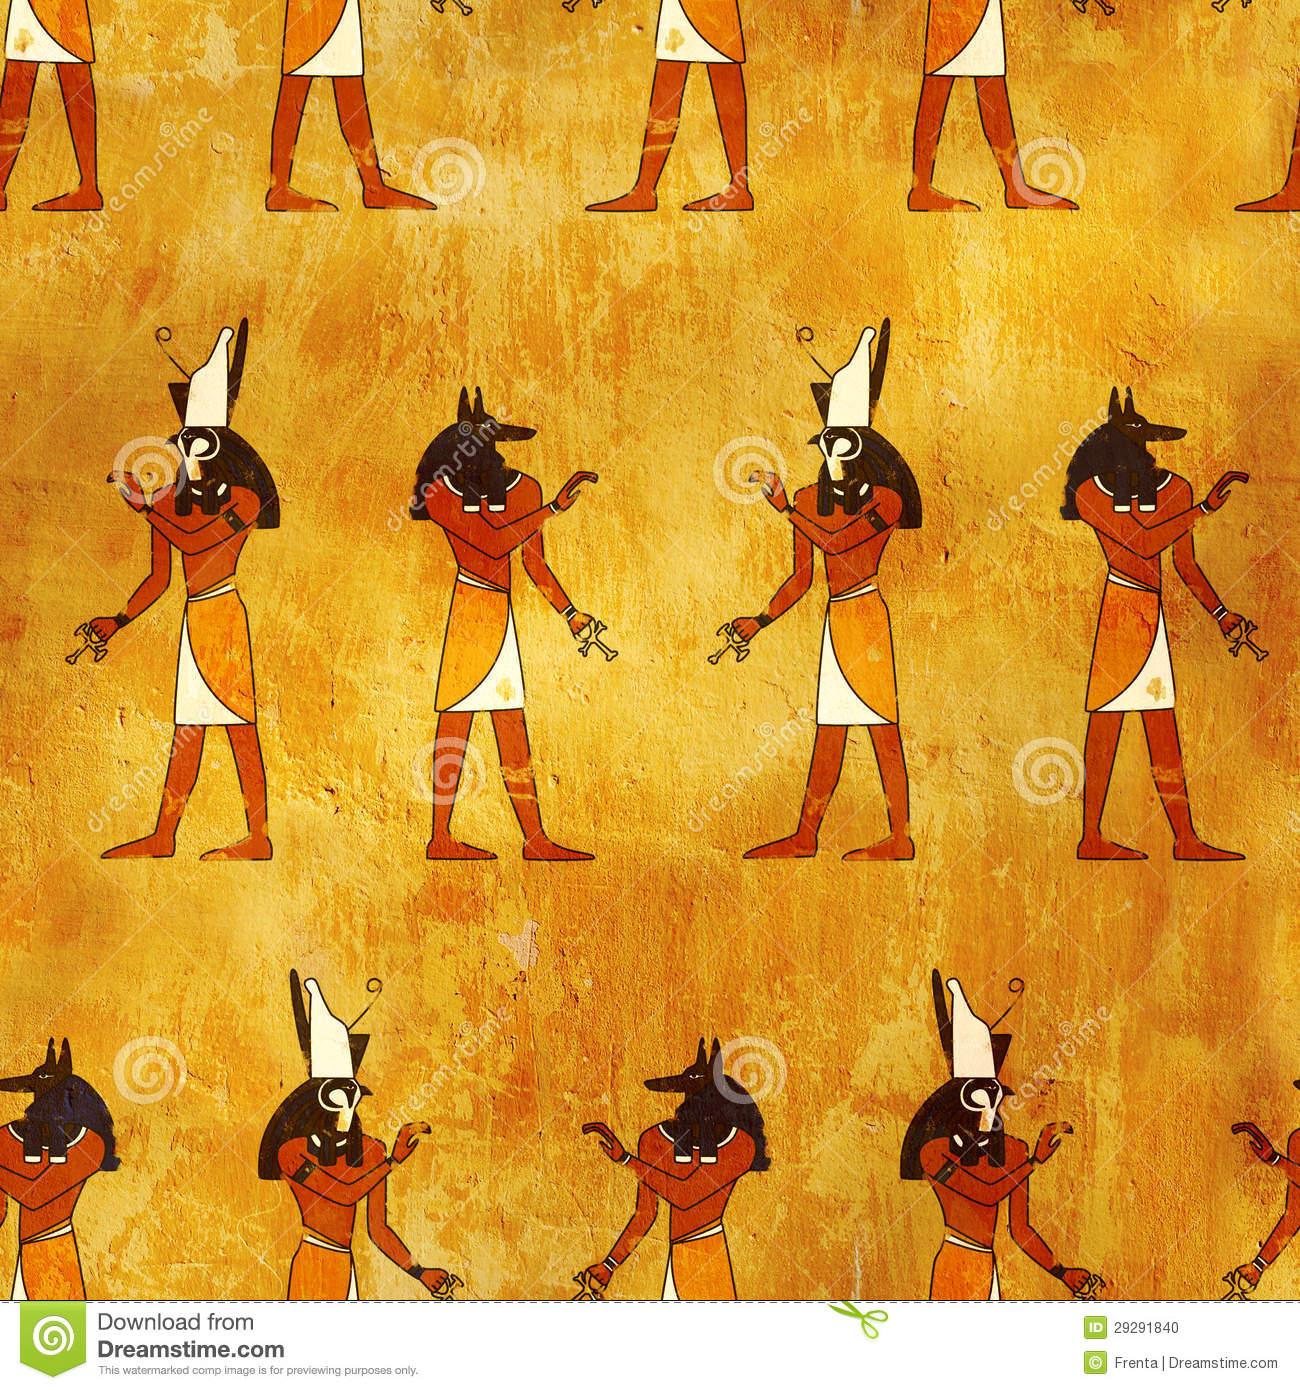 Egyptian Mythology Wallpaper Wallpapersafari